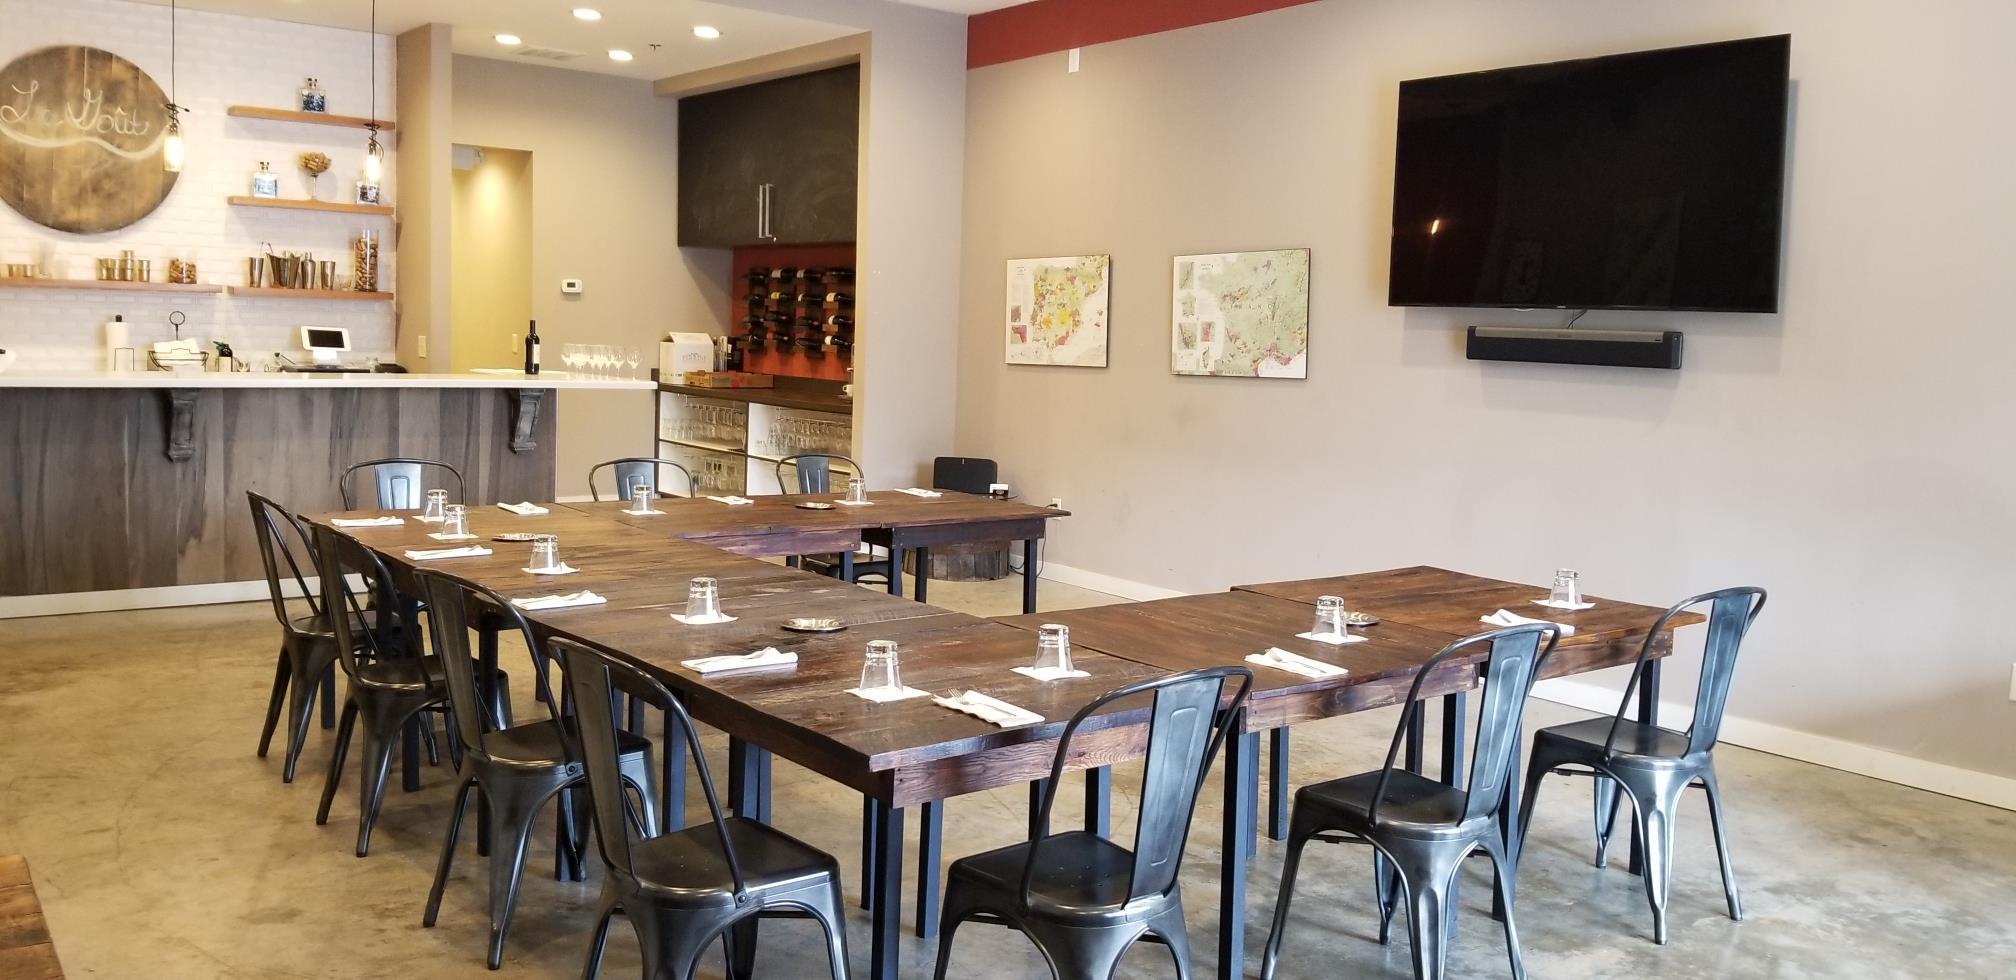 Le Goût, Special Events & Tasting Room - Le Goût, Special Events & Tasting Room